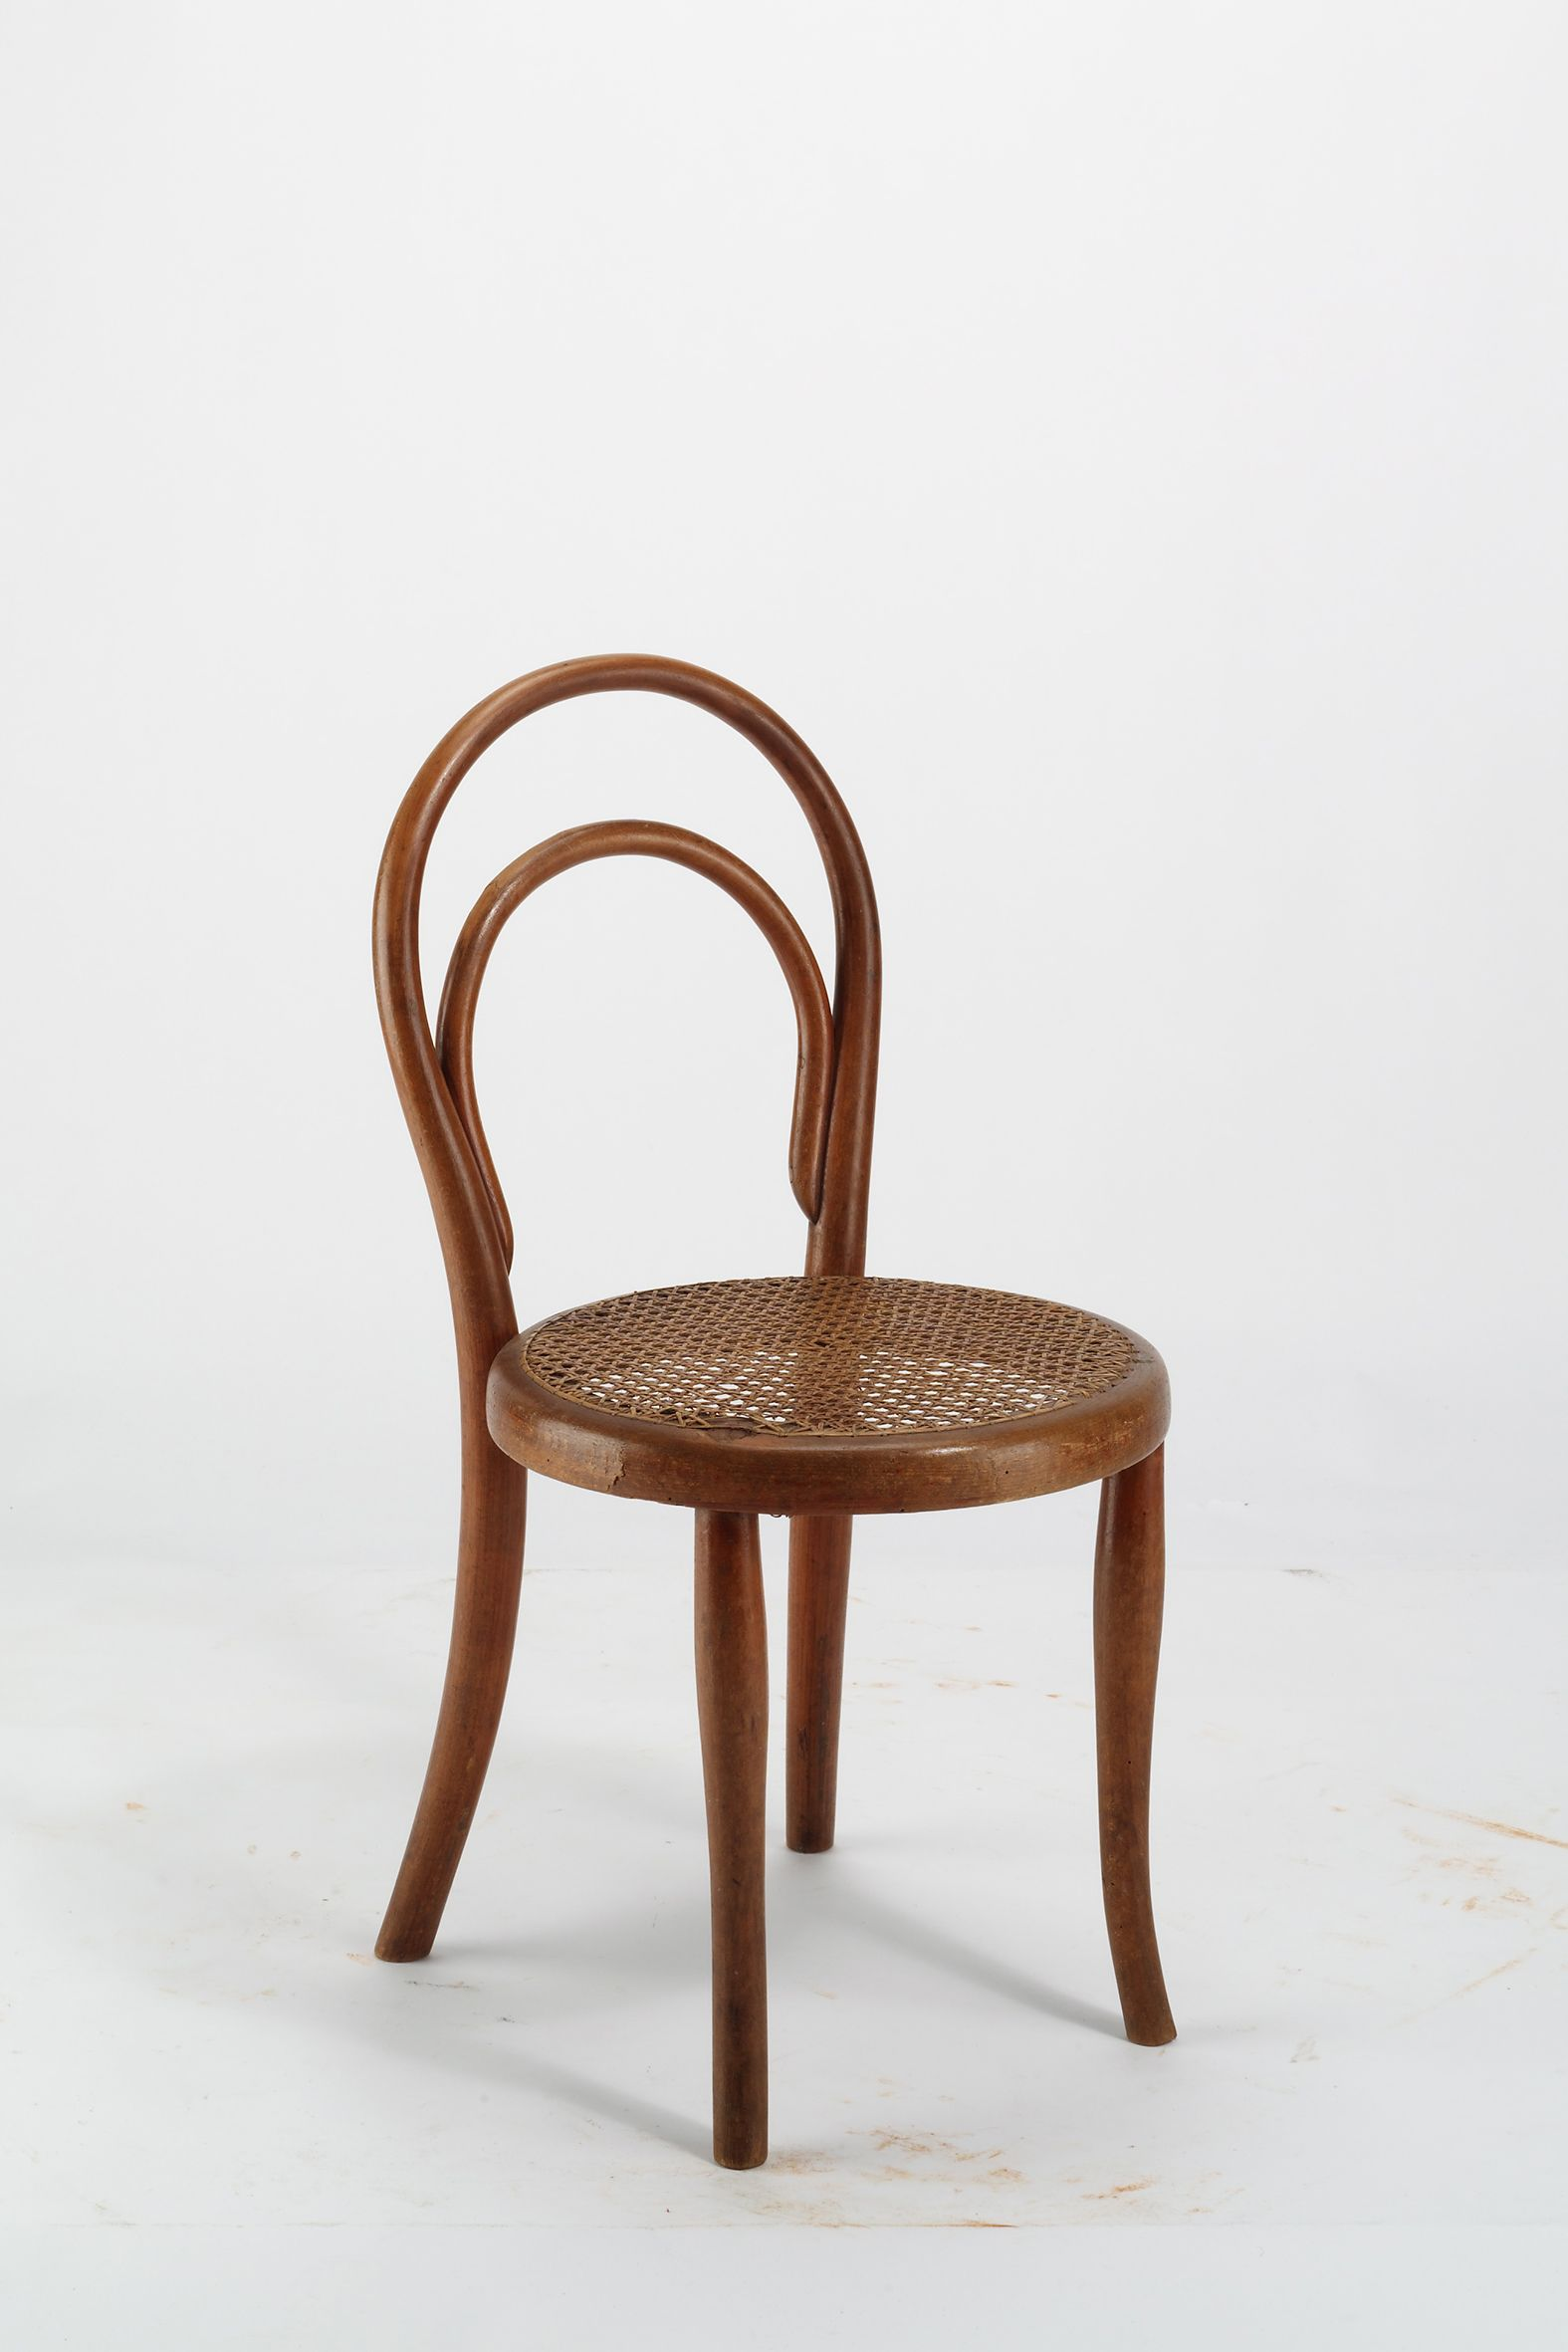 Gebruder Thonet Thonet Kinderstuhl Nr 1 Um 1870 Chaise